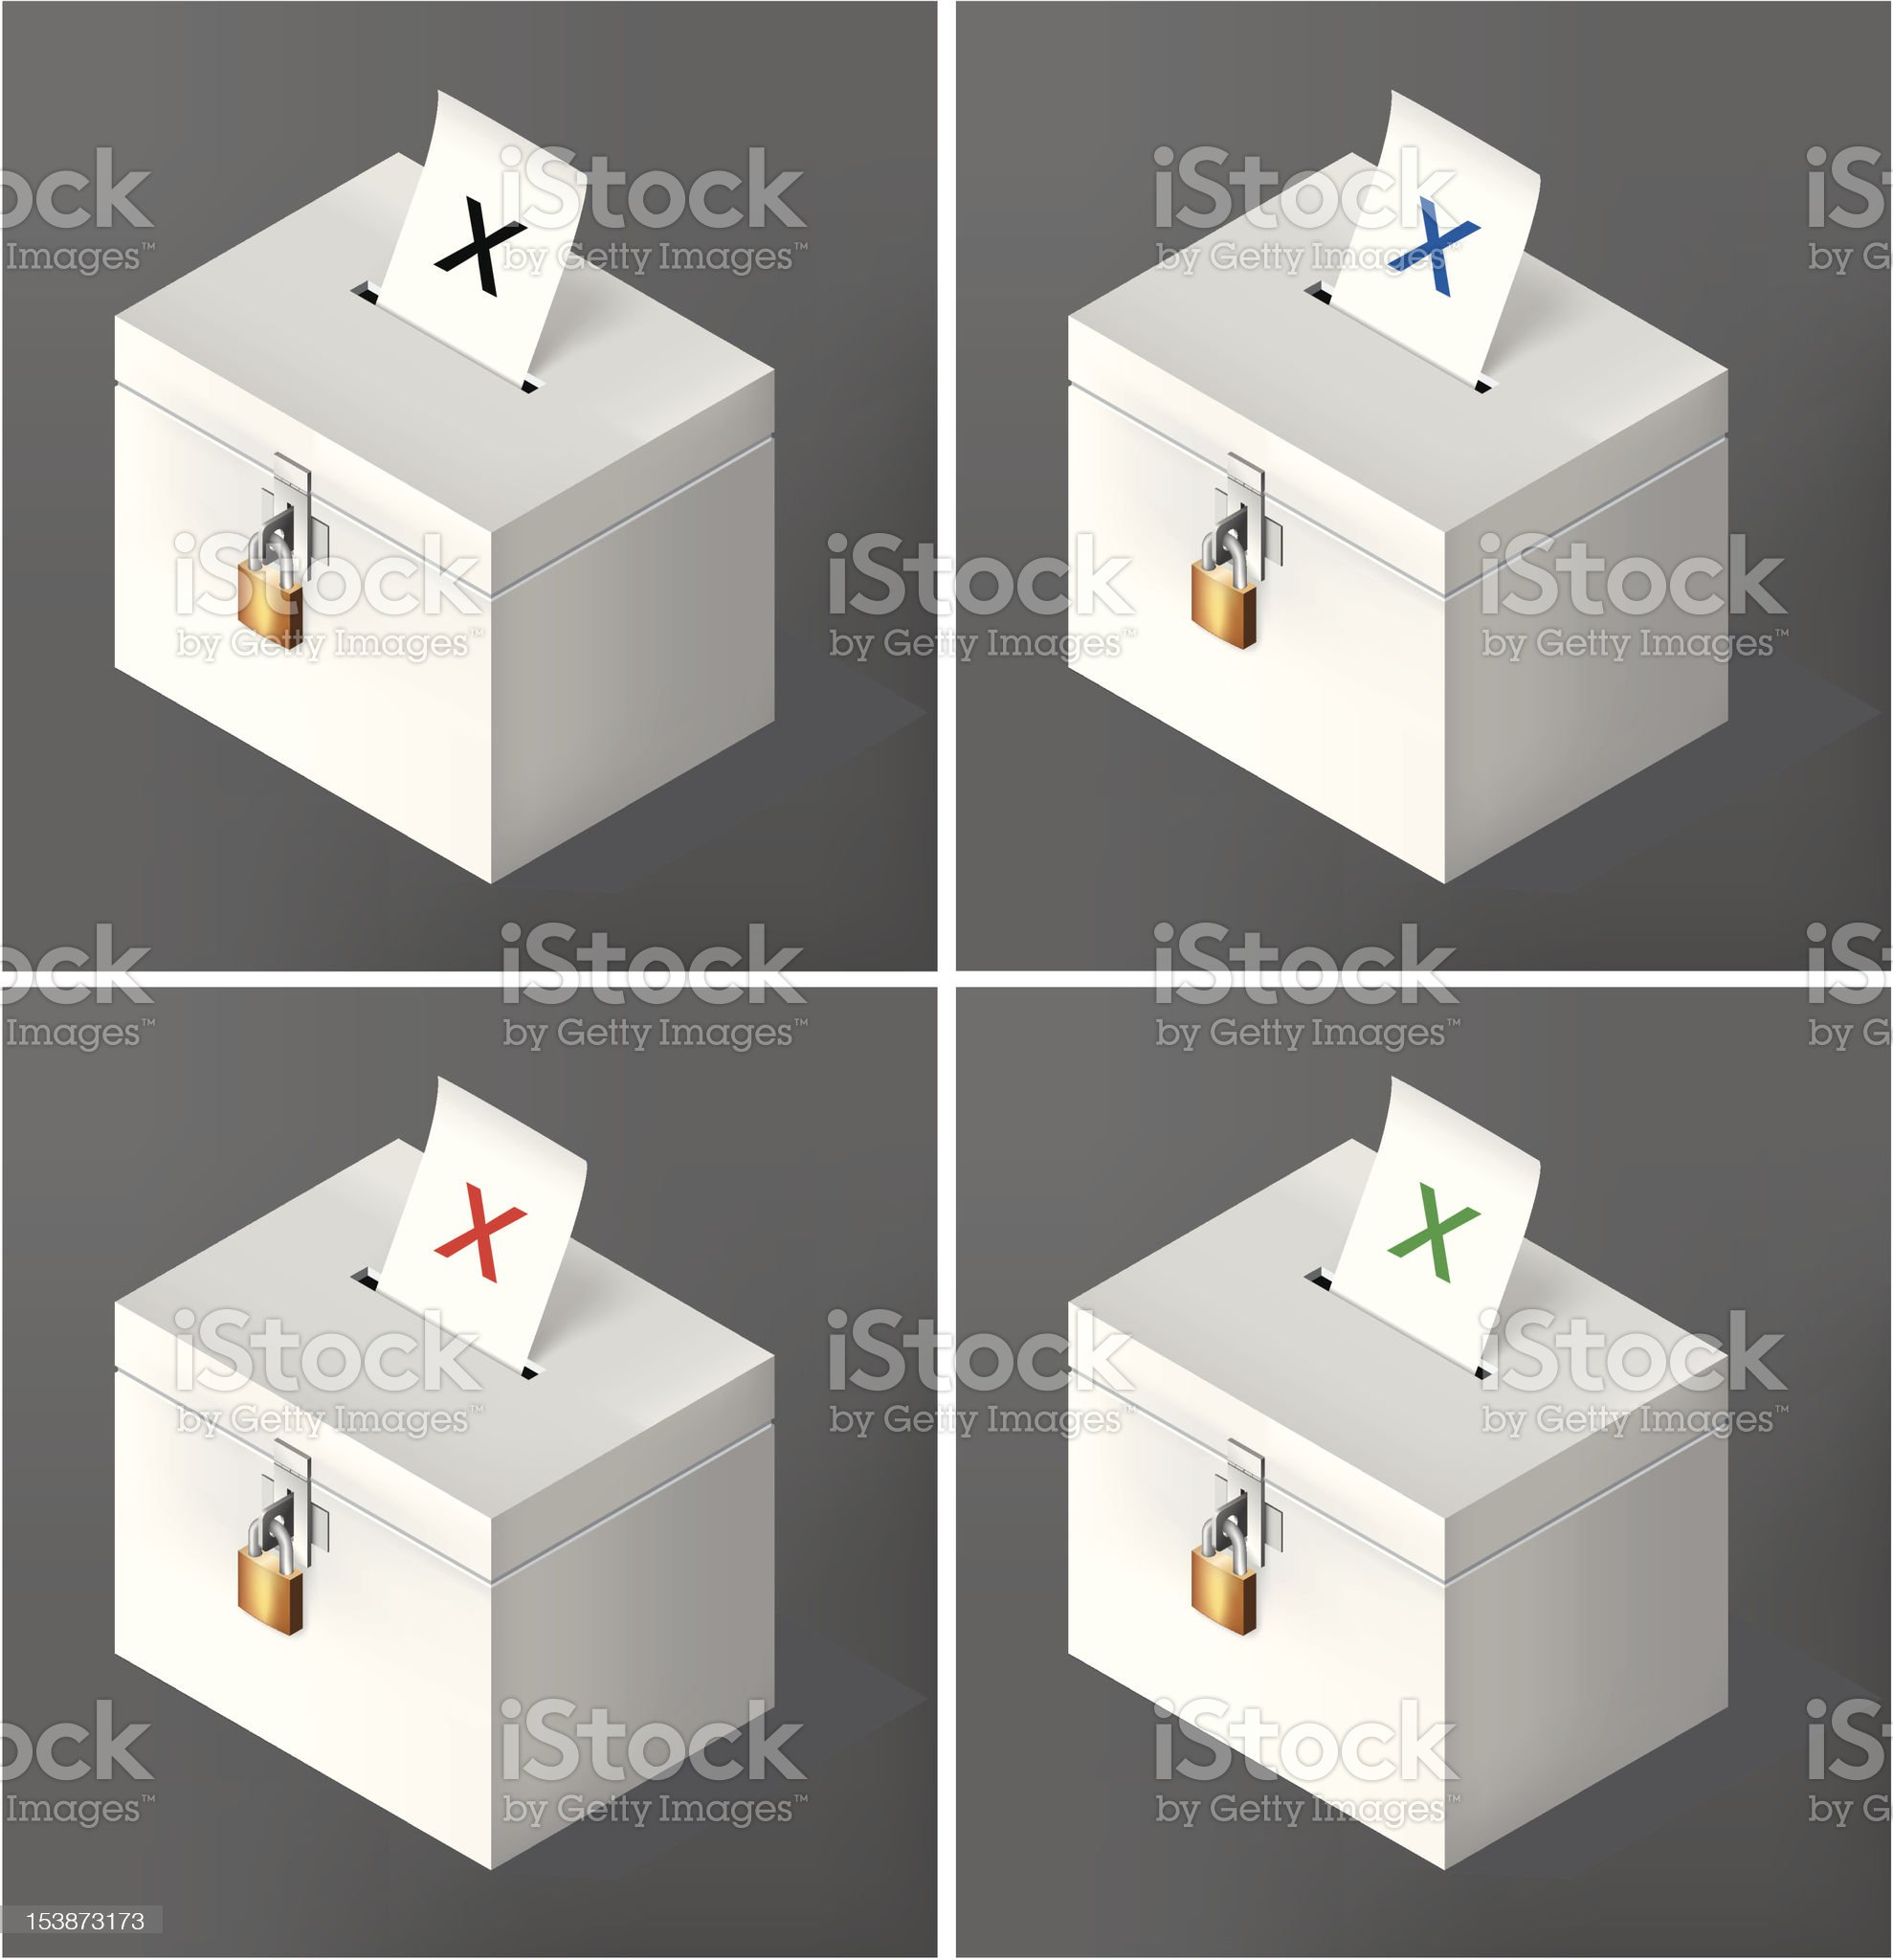 Crossed voting ballot royalty-free stock vector art